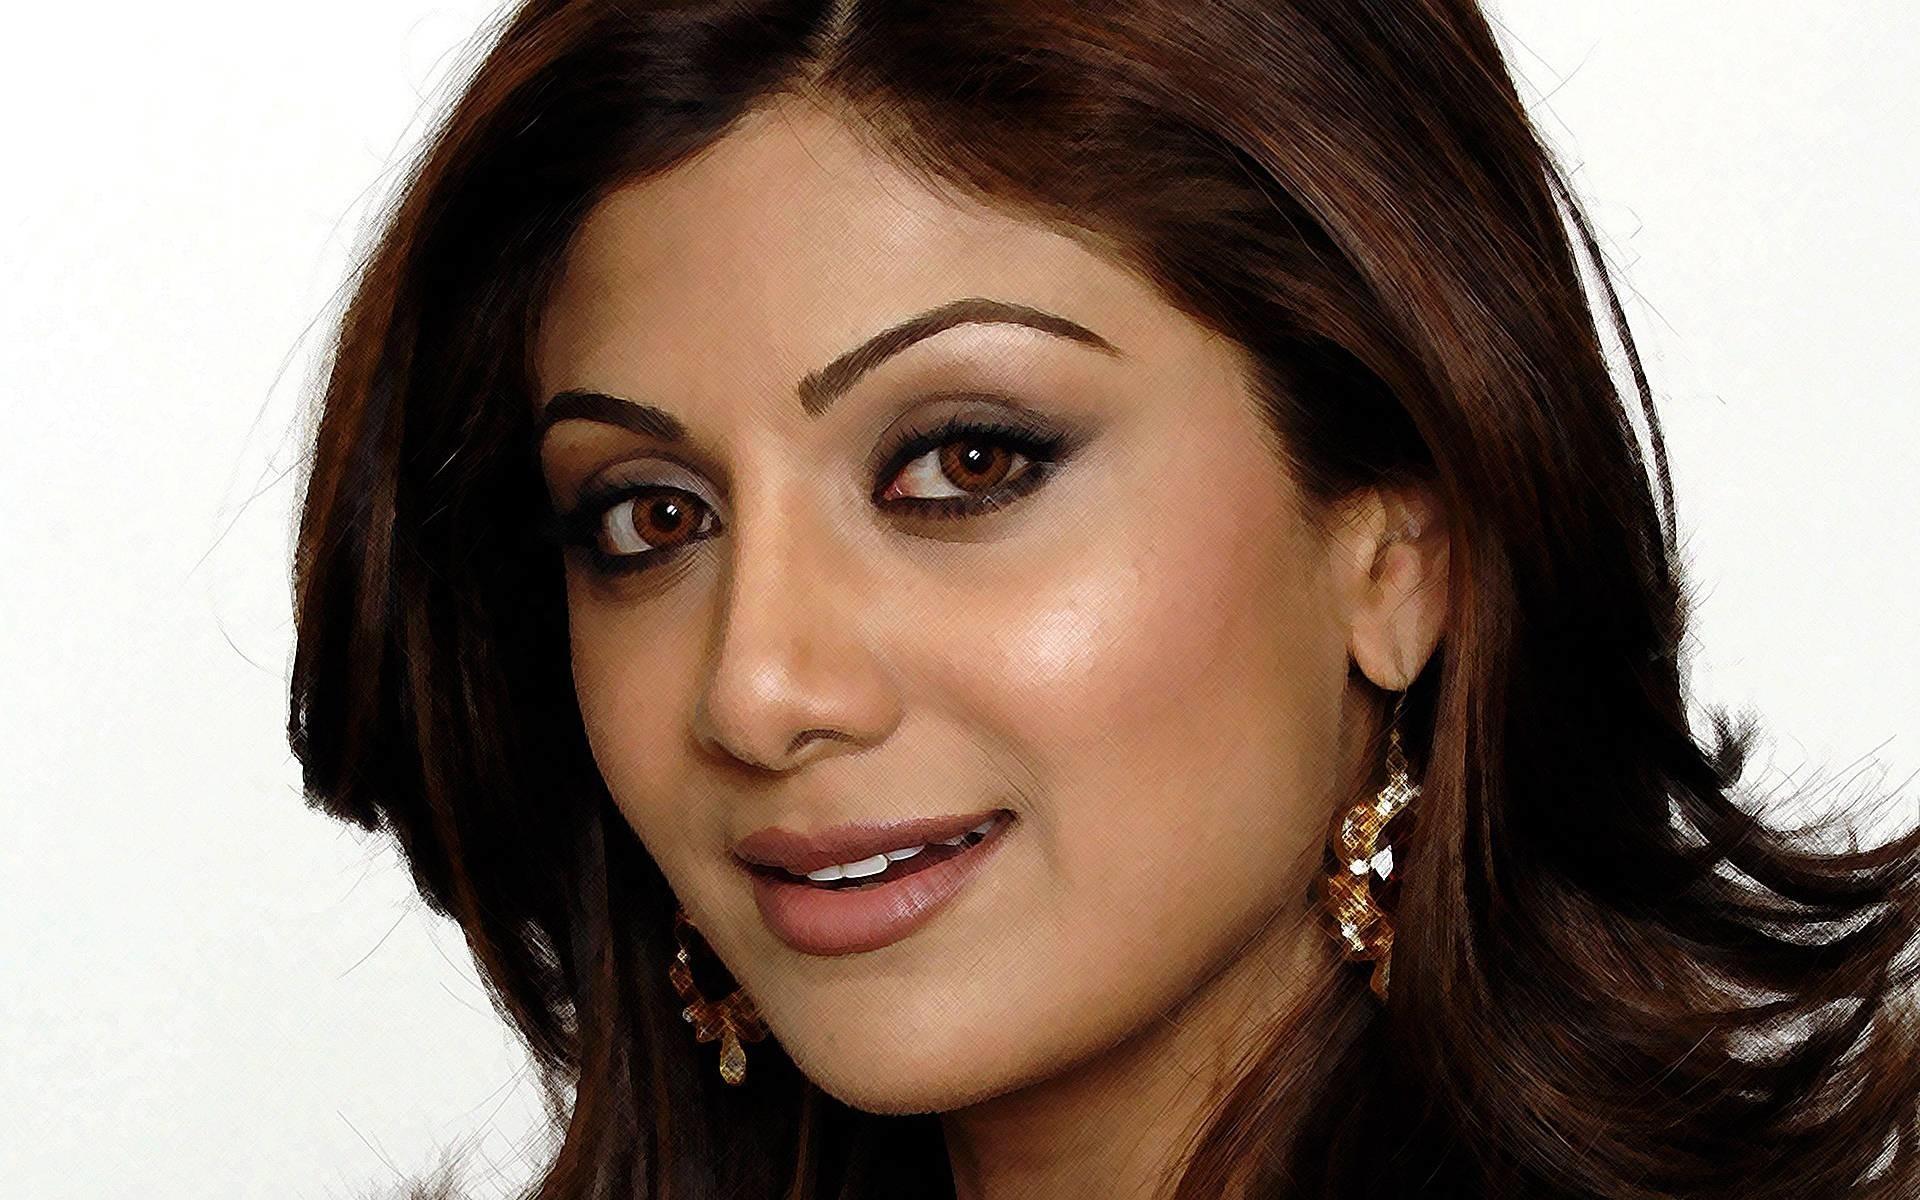 Bollywood Actress Wallpaper Hd 2018 74 Images